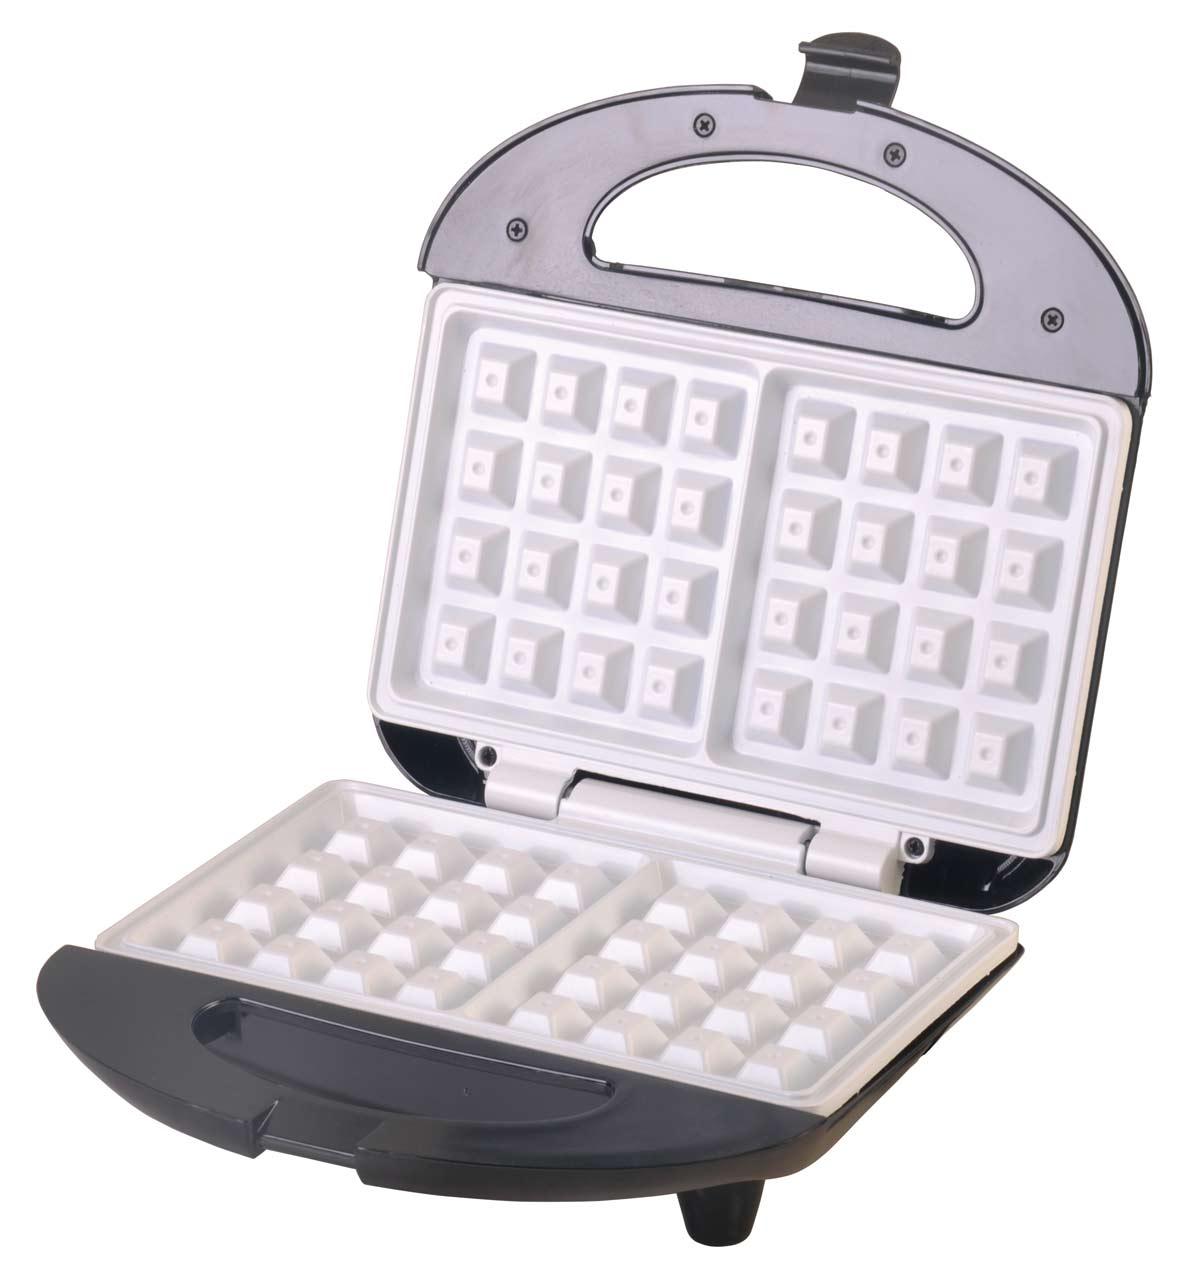 Waffeleisen Camry CR3019 Waffel-Automat Keramik-Platten – Bild 1